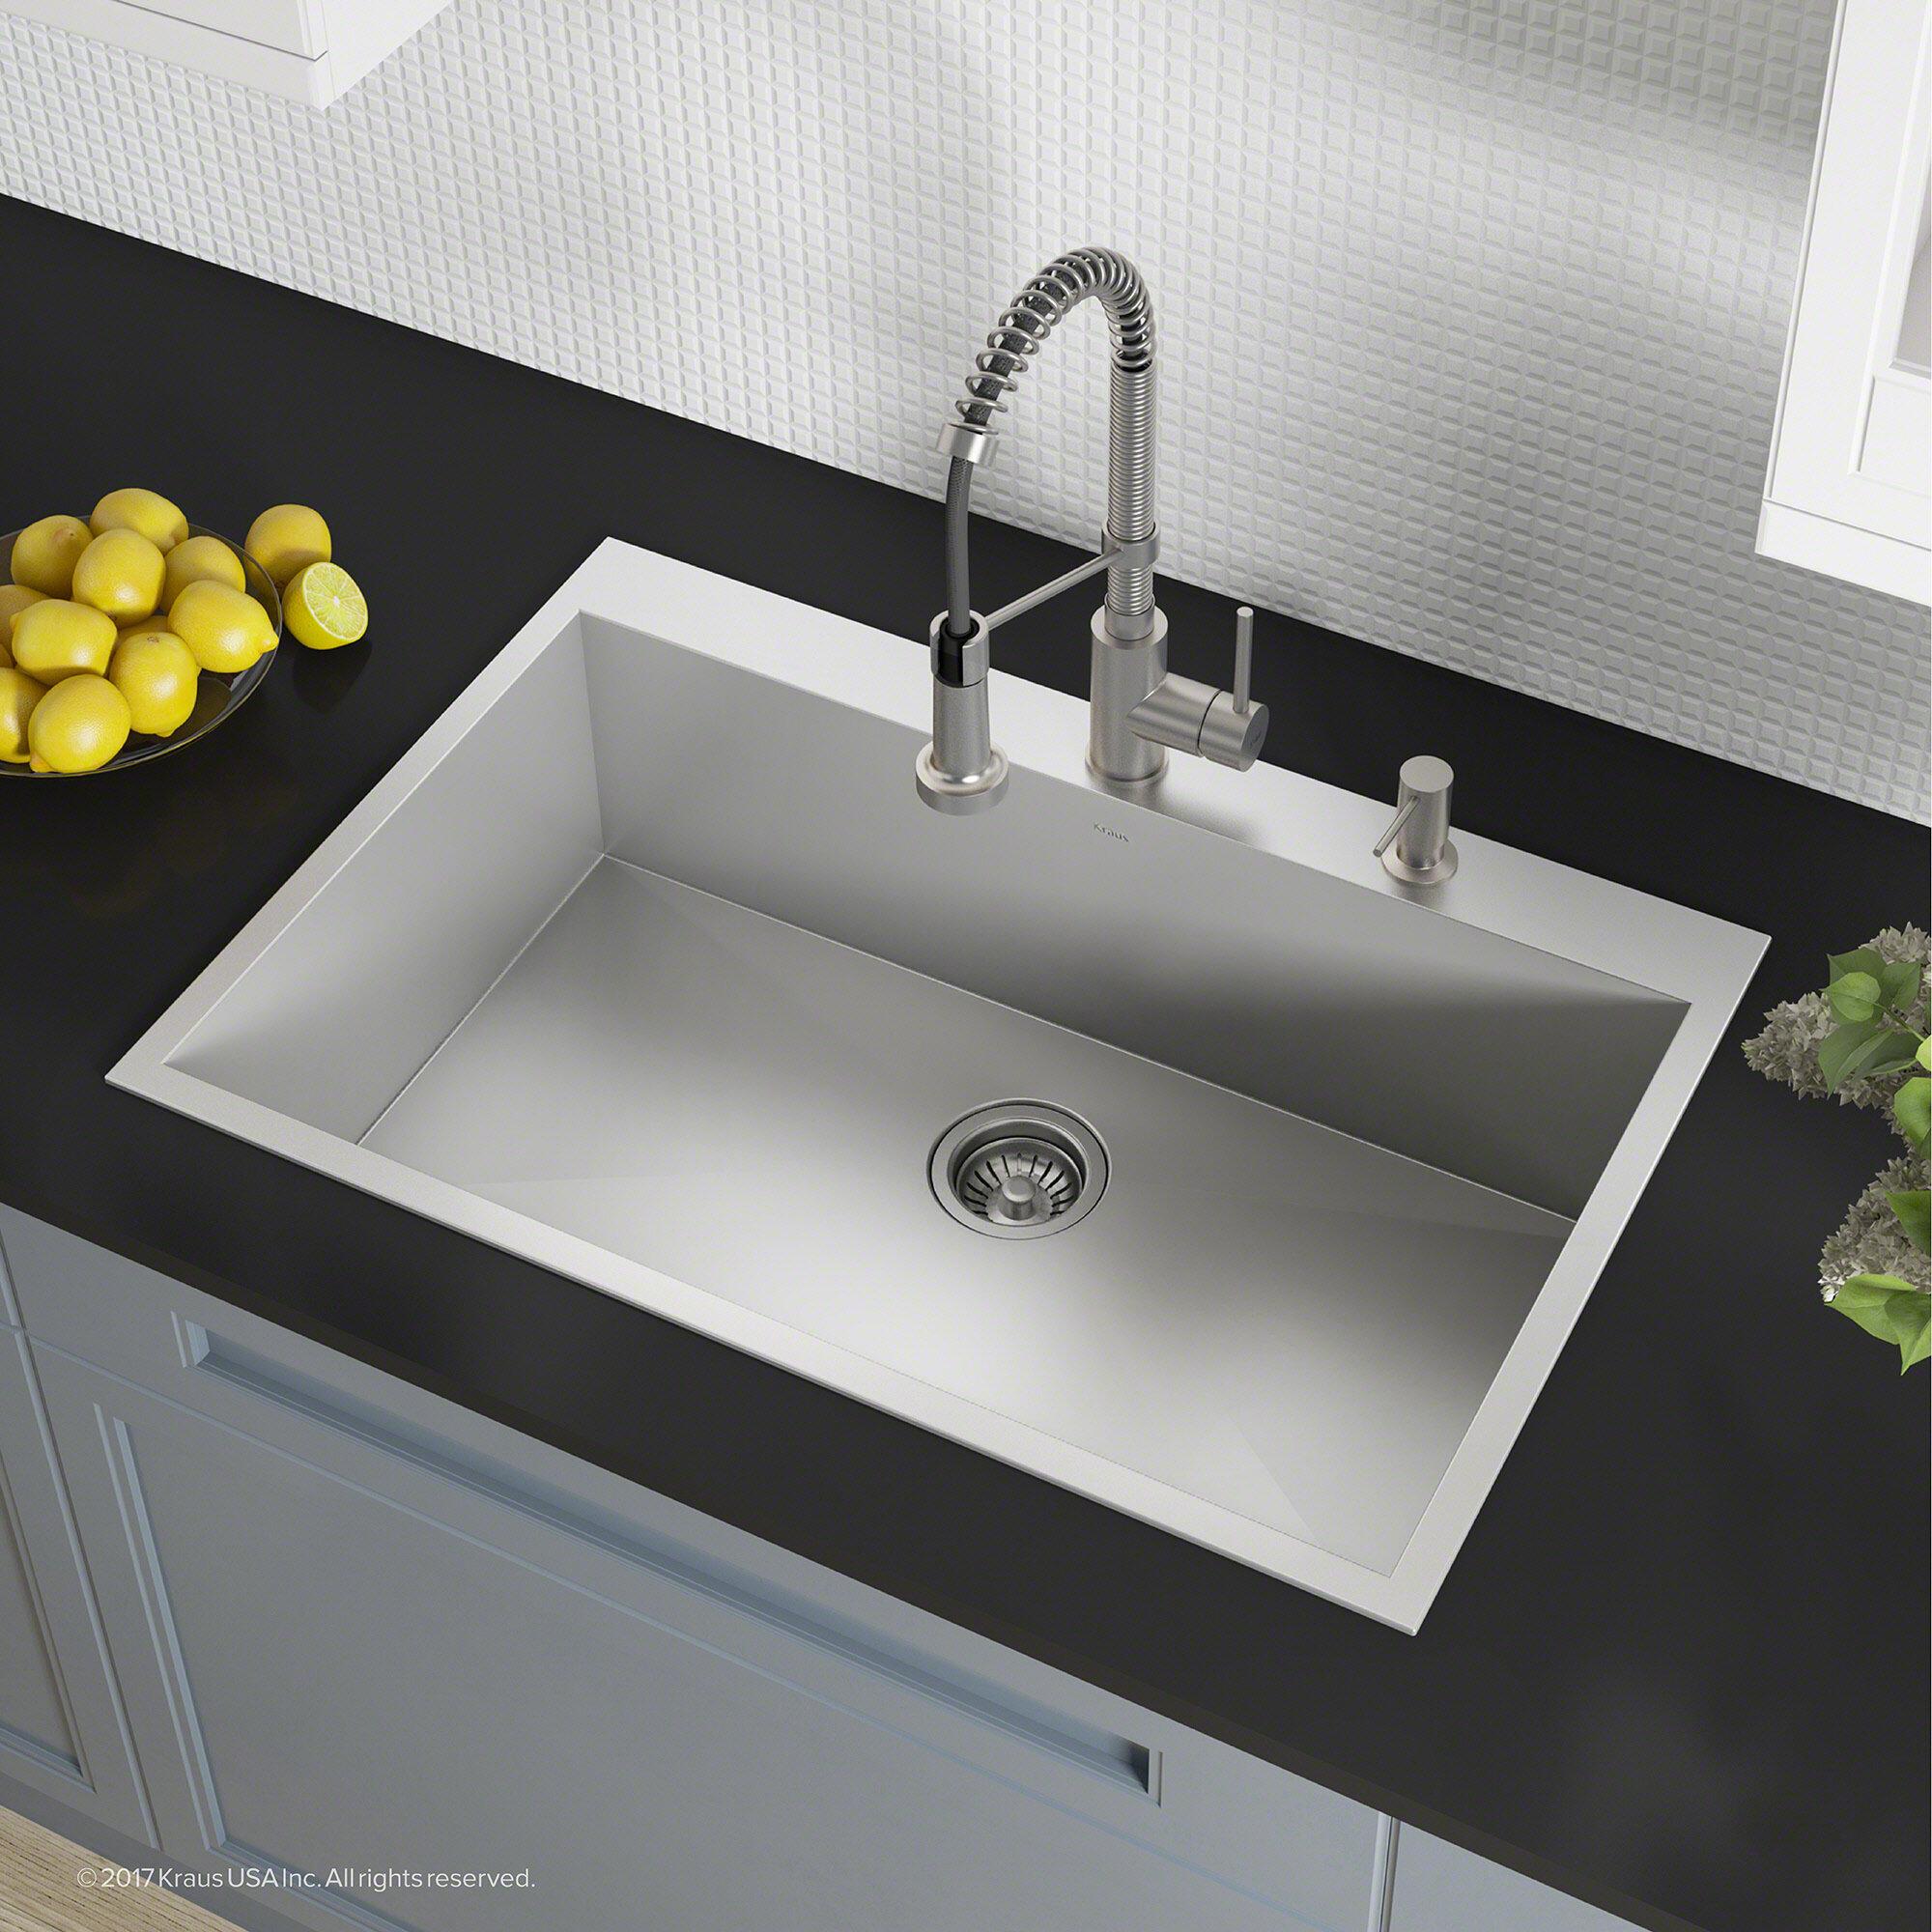 New Deep Top Mount Drop In Stainless Steel Single Bowl Kitchen Sink Variety Size Bathroom Sinks Home Garden